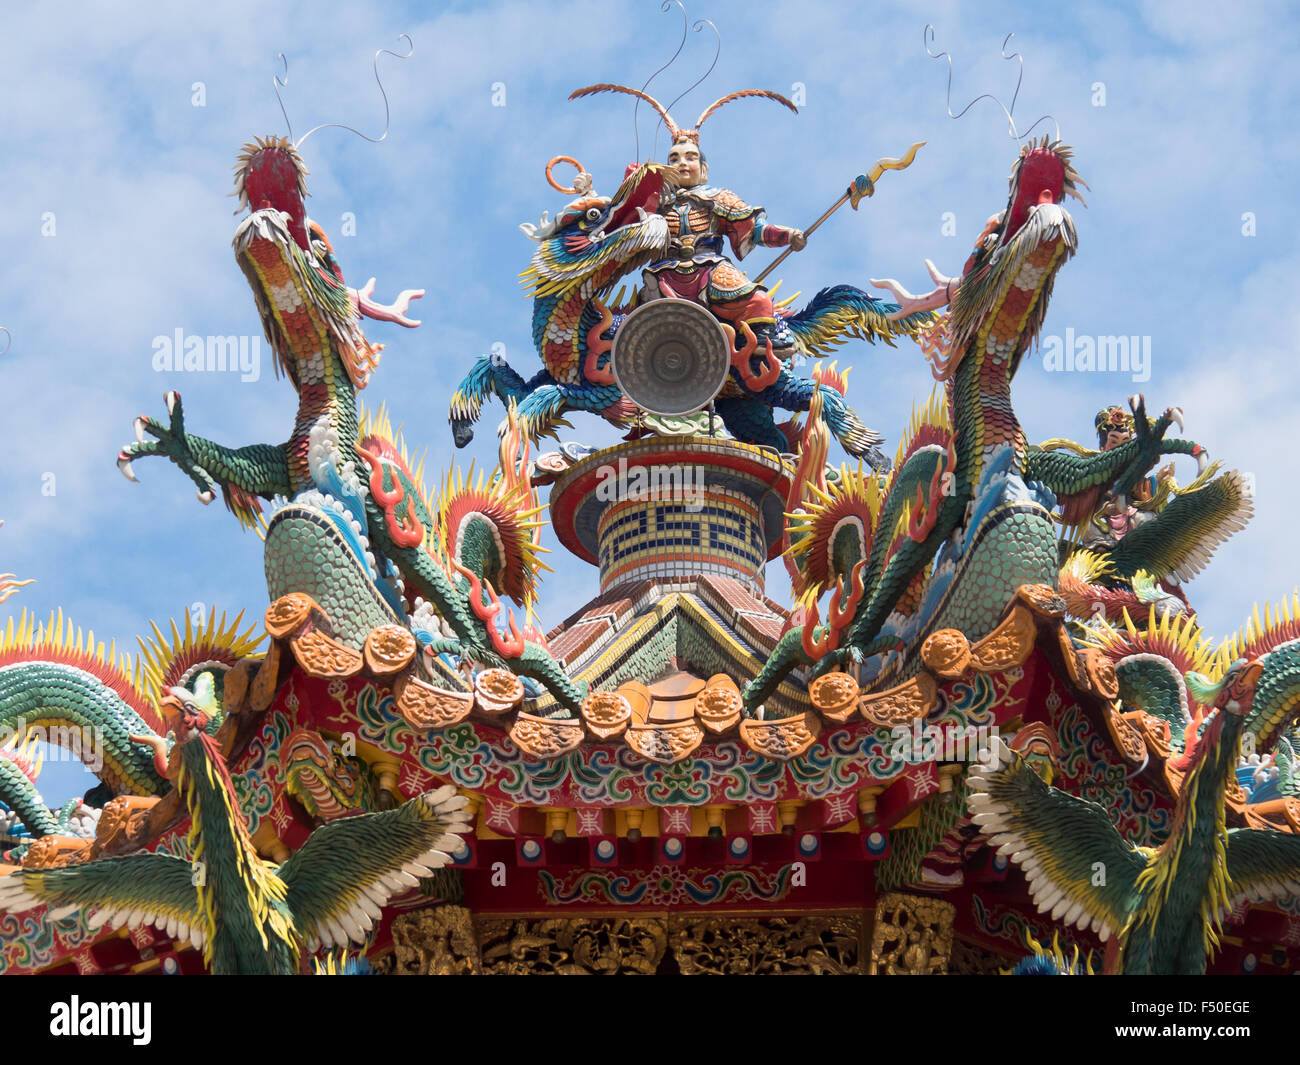 Ornamentadas esculturas de mosaico en la parte superior de un Templo Taoísta en Taiwán Imagen De Stock